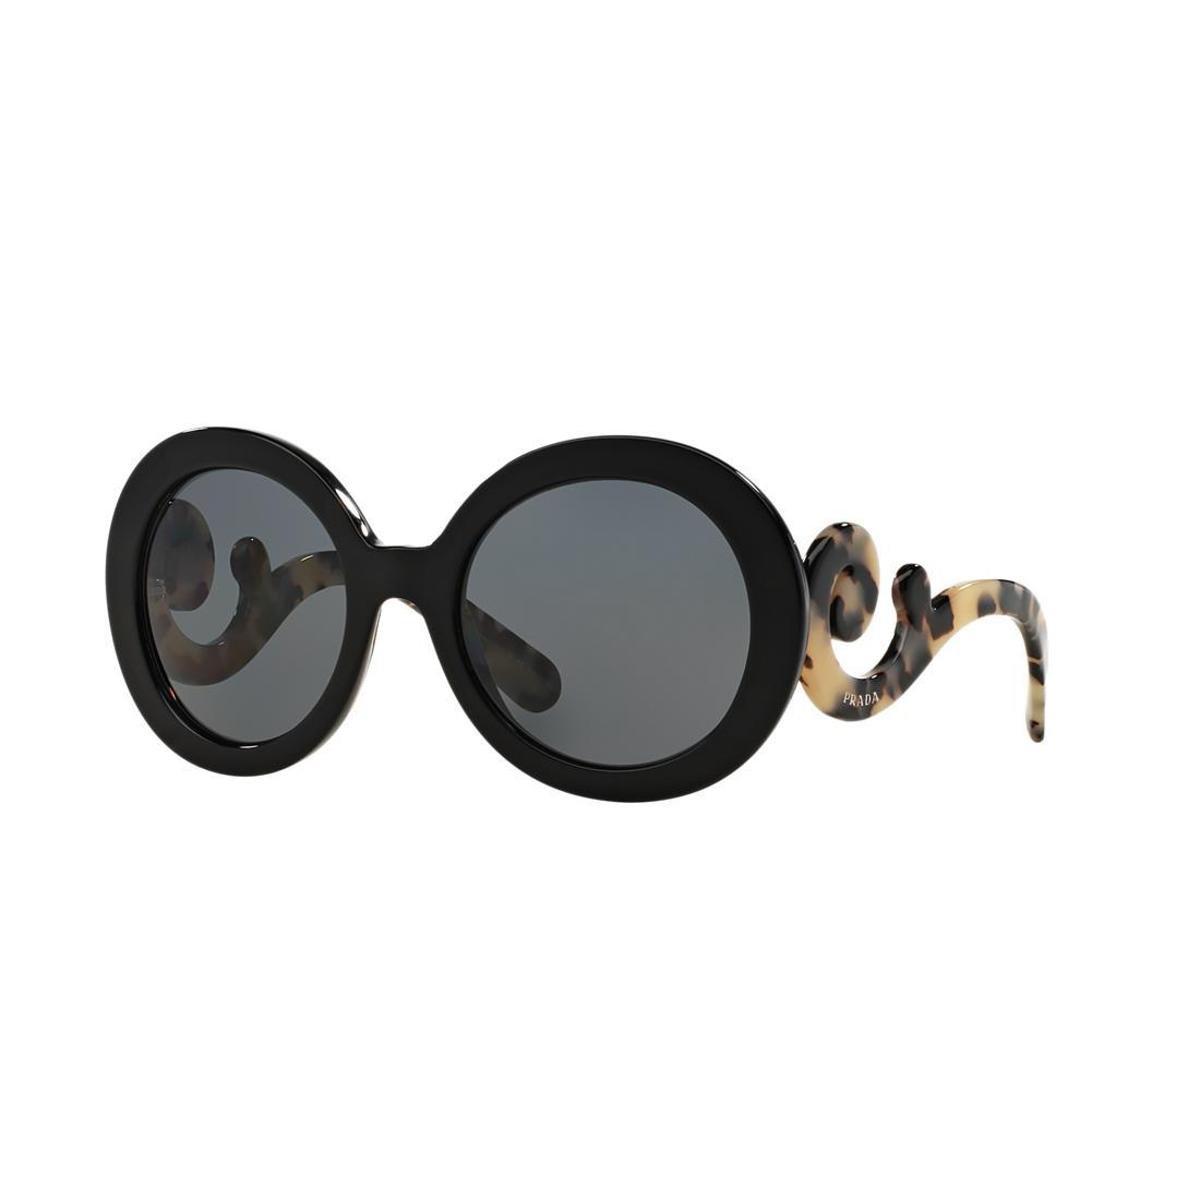 Óculos de Sol Prada PR 27NS Minimal Baroque - Compre Agora   Zattini b98712ab00